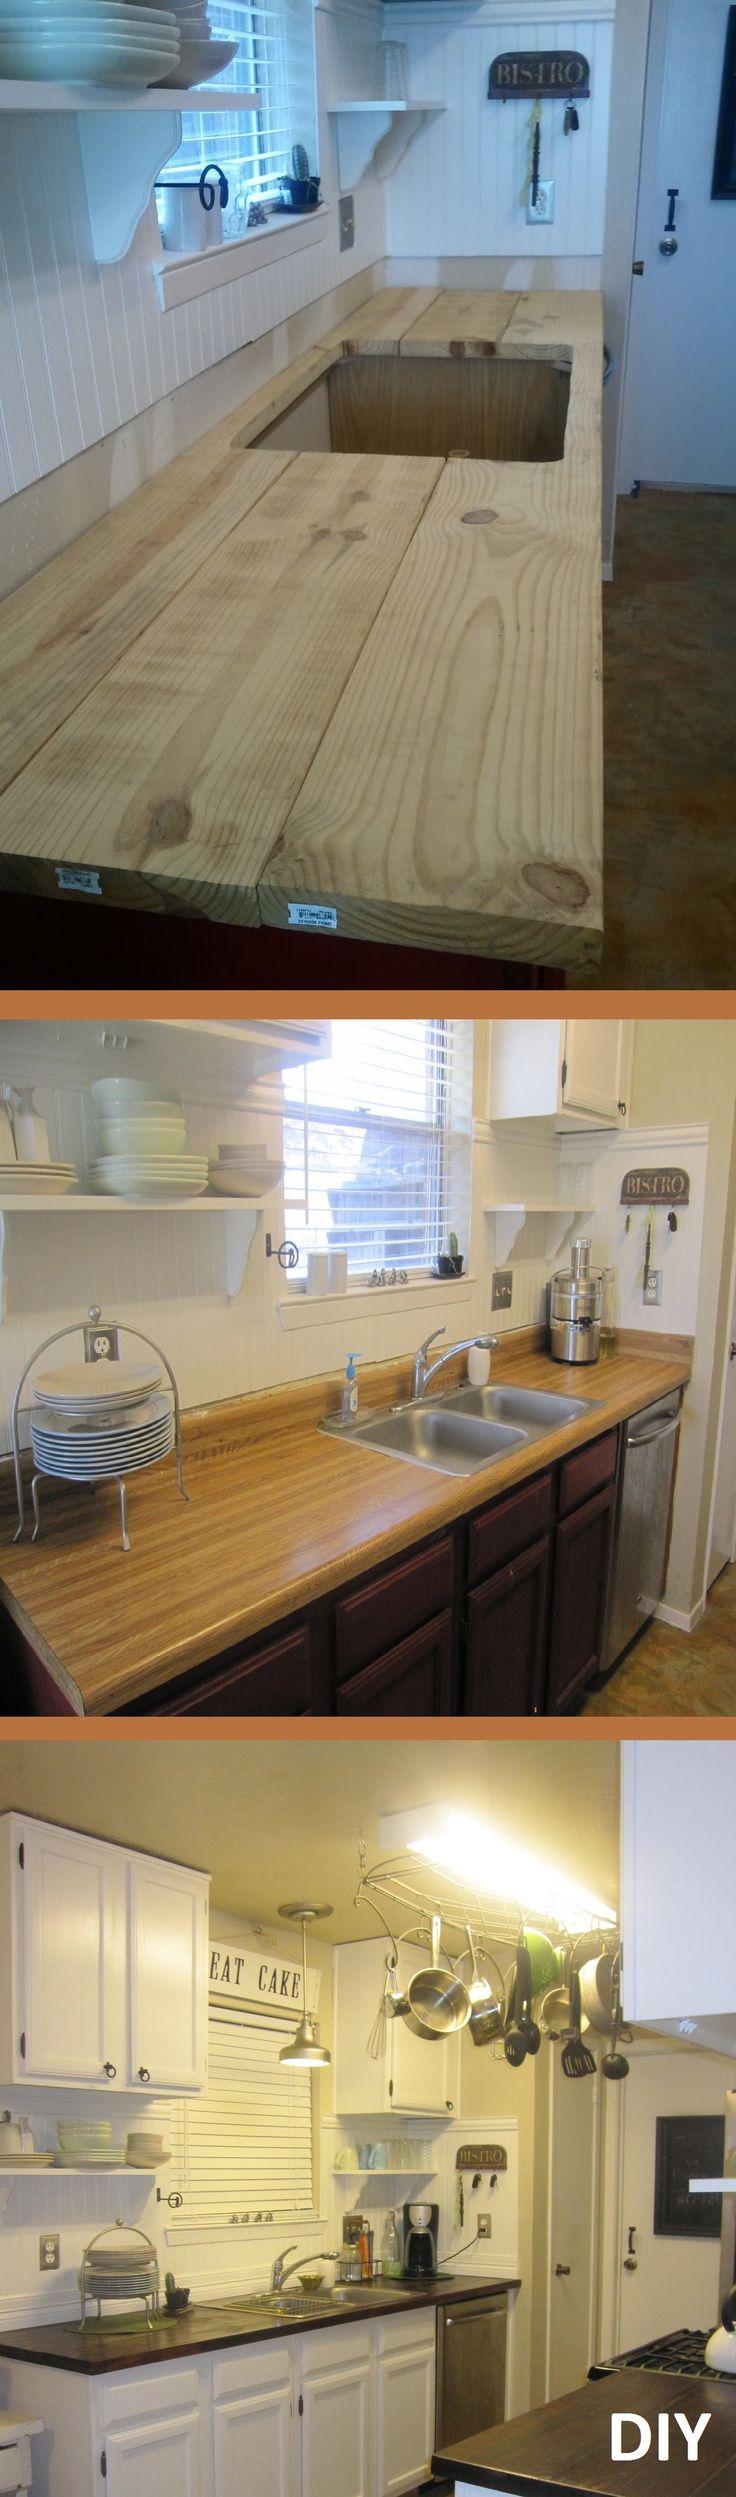 Diy Kitchen Countertop 17 Best Ideas About Kitchen Countertop Organization On Pinterest